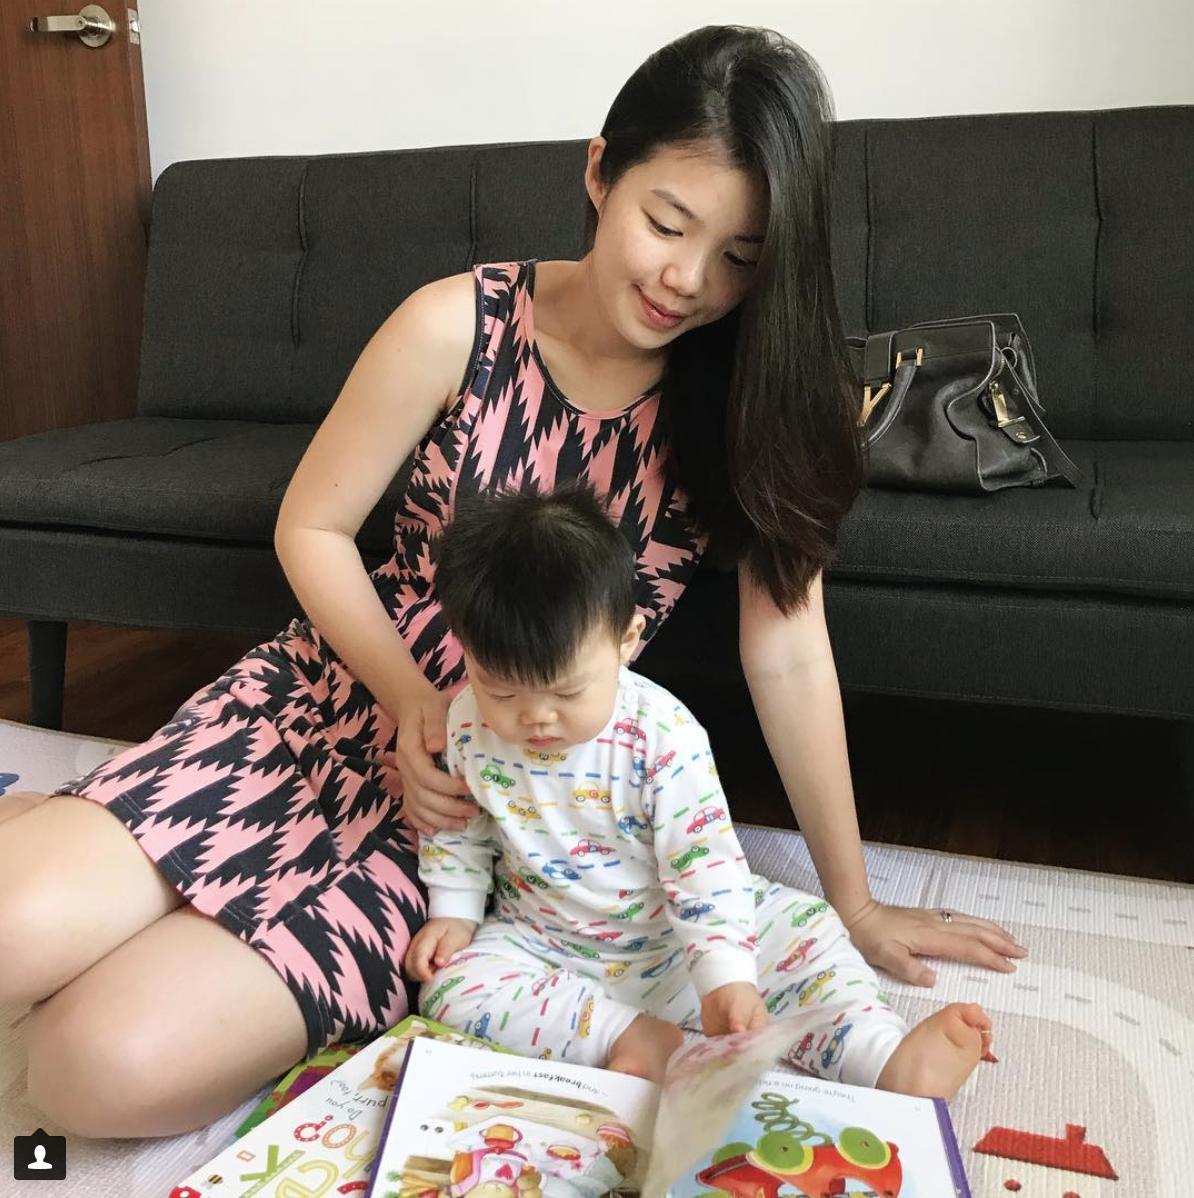 WFHM bonding with son baby activity